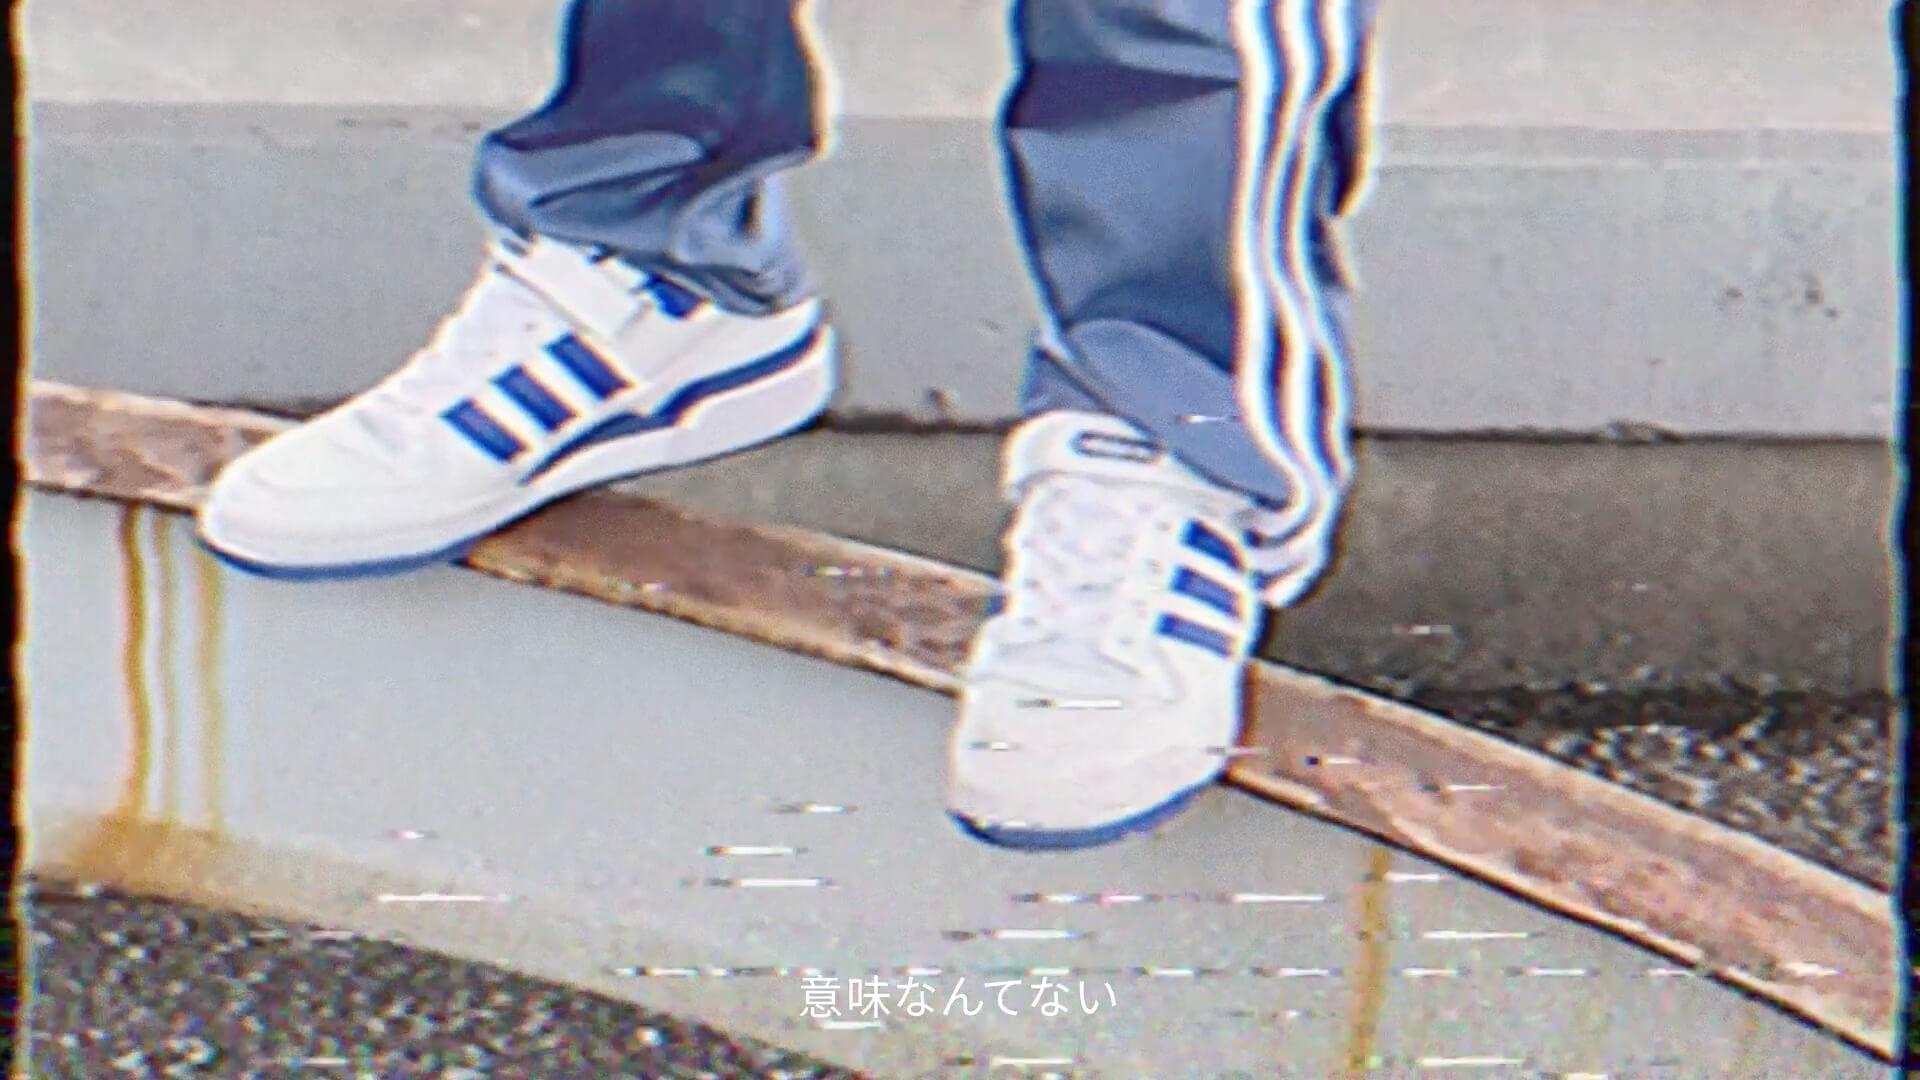 adidas Originals『FORUM』のプロモーションフィルムが公開!King Gnu常田大希が出演 life210716_adidasoriginals_forum_9